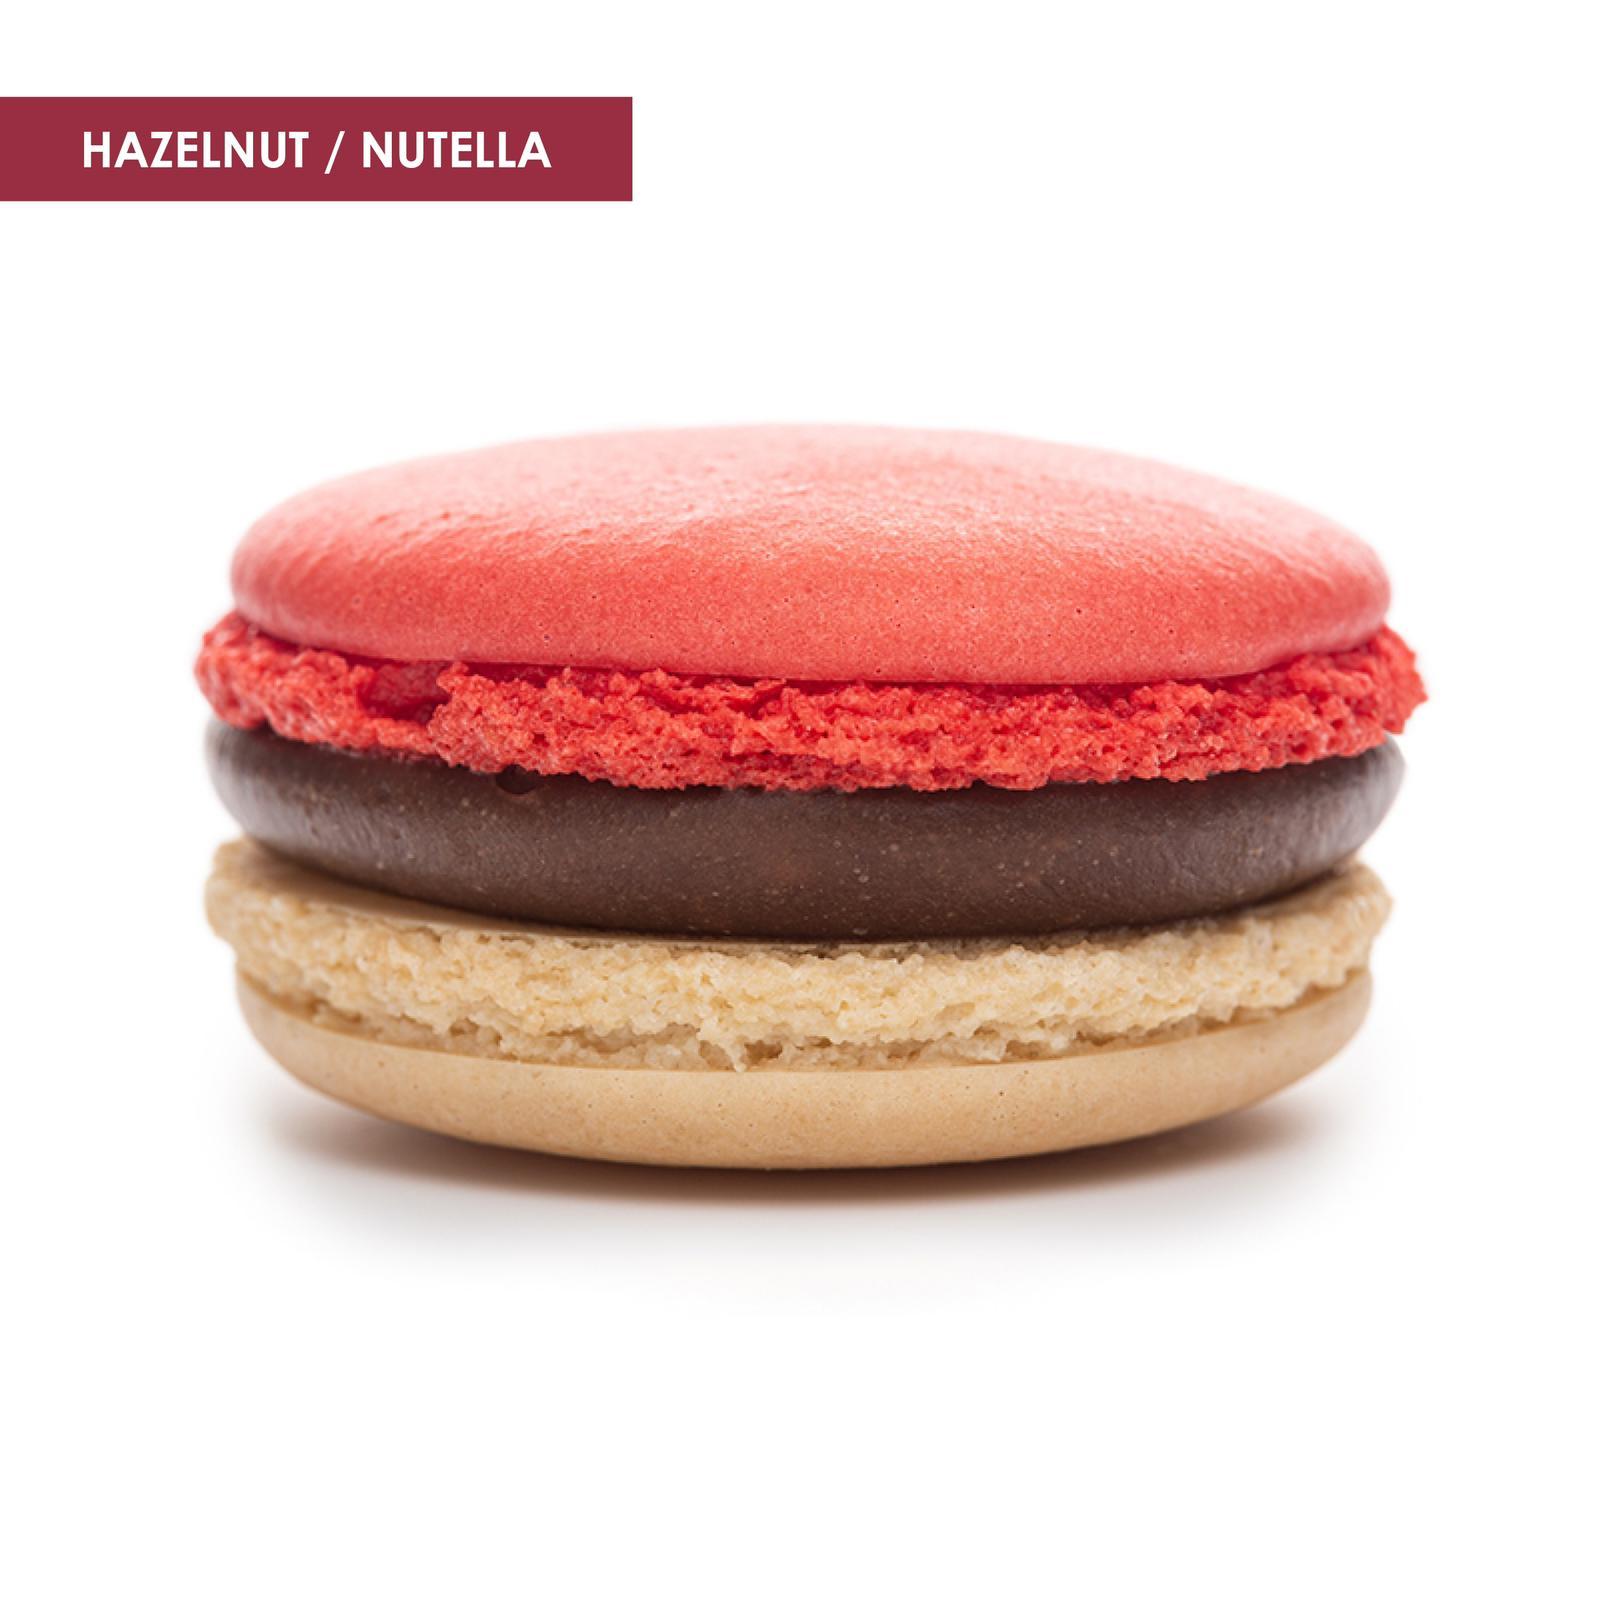 Hazelnut/Nutella